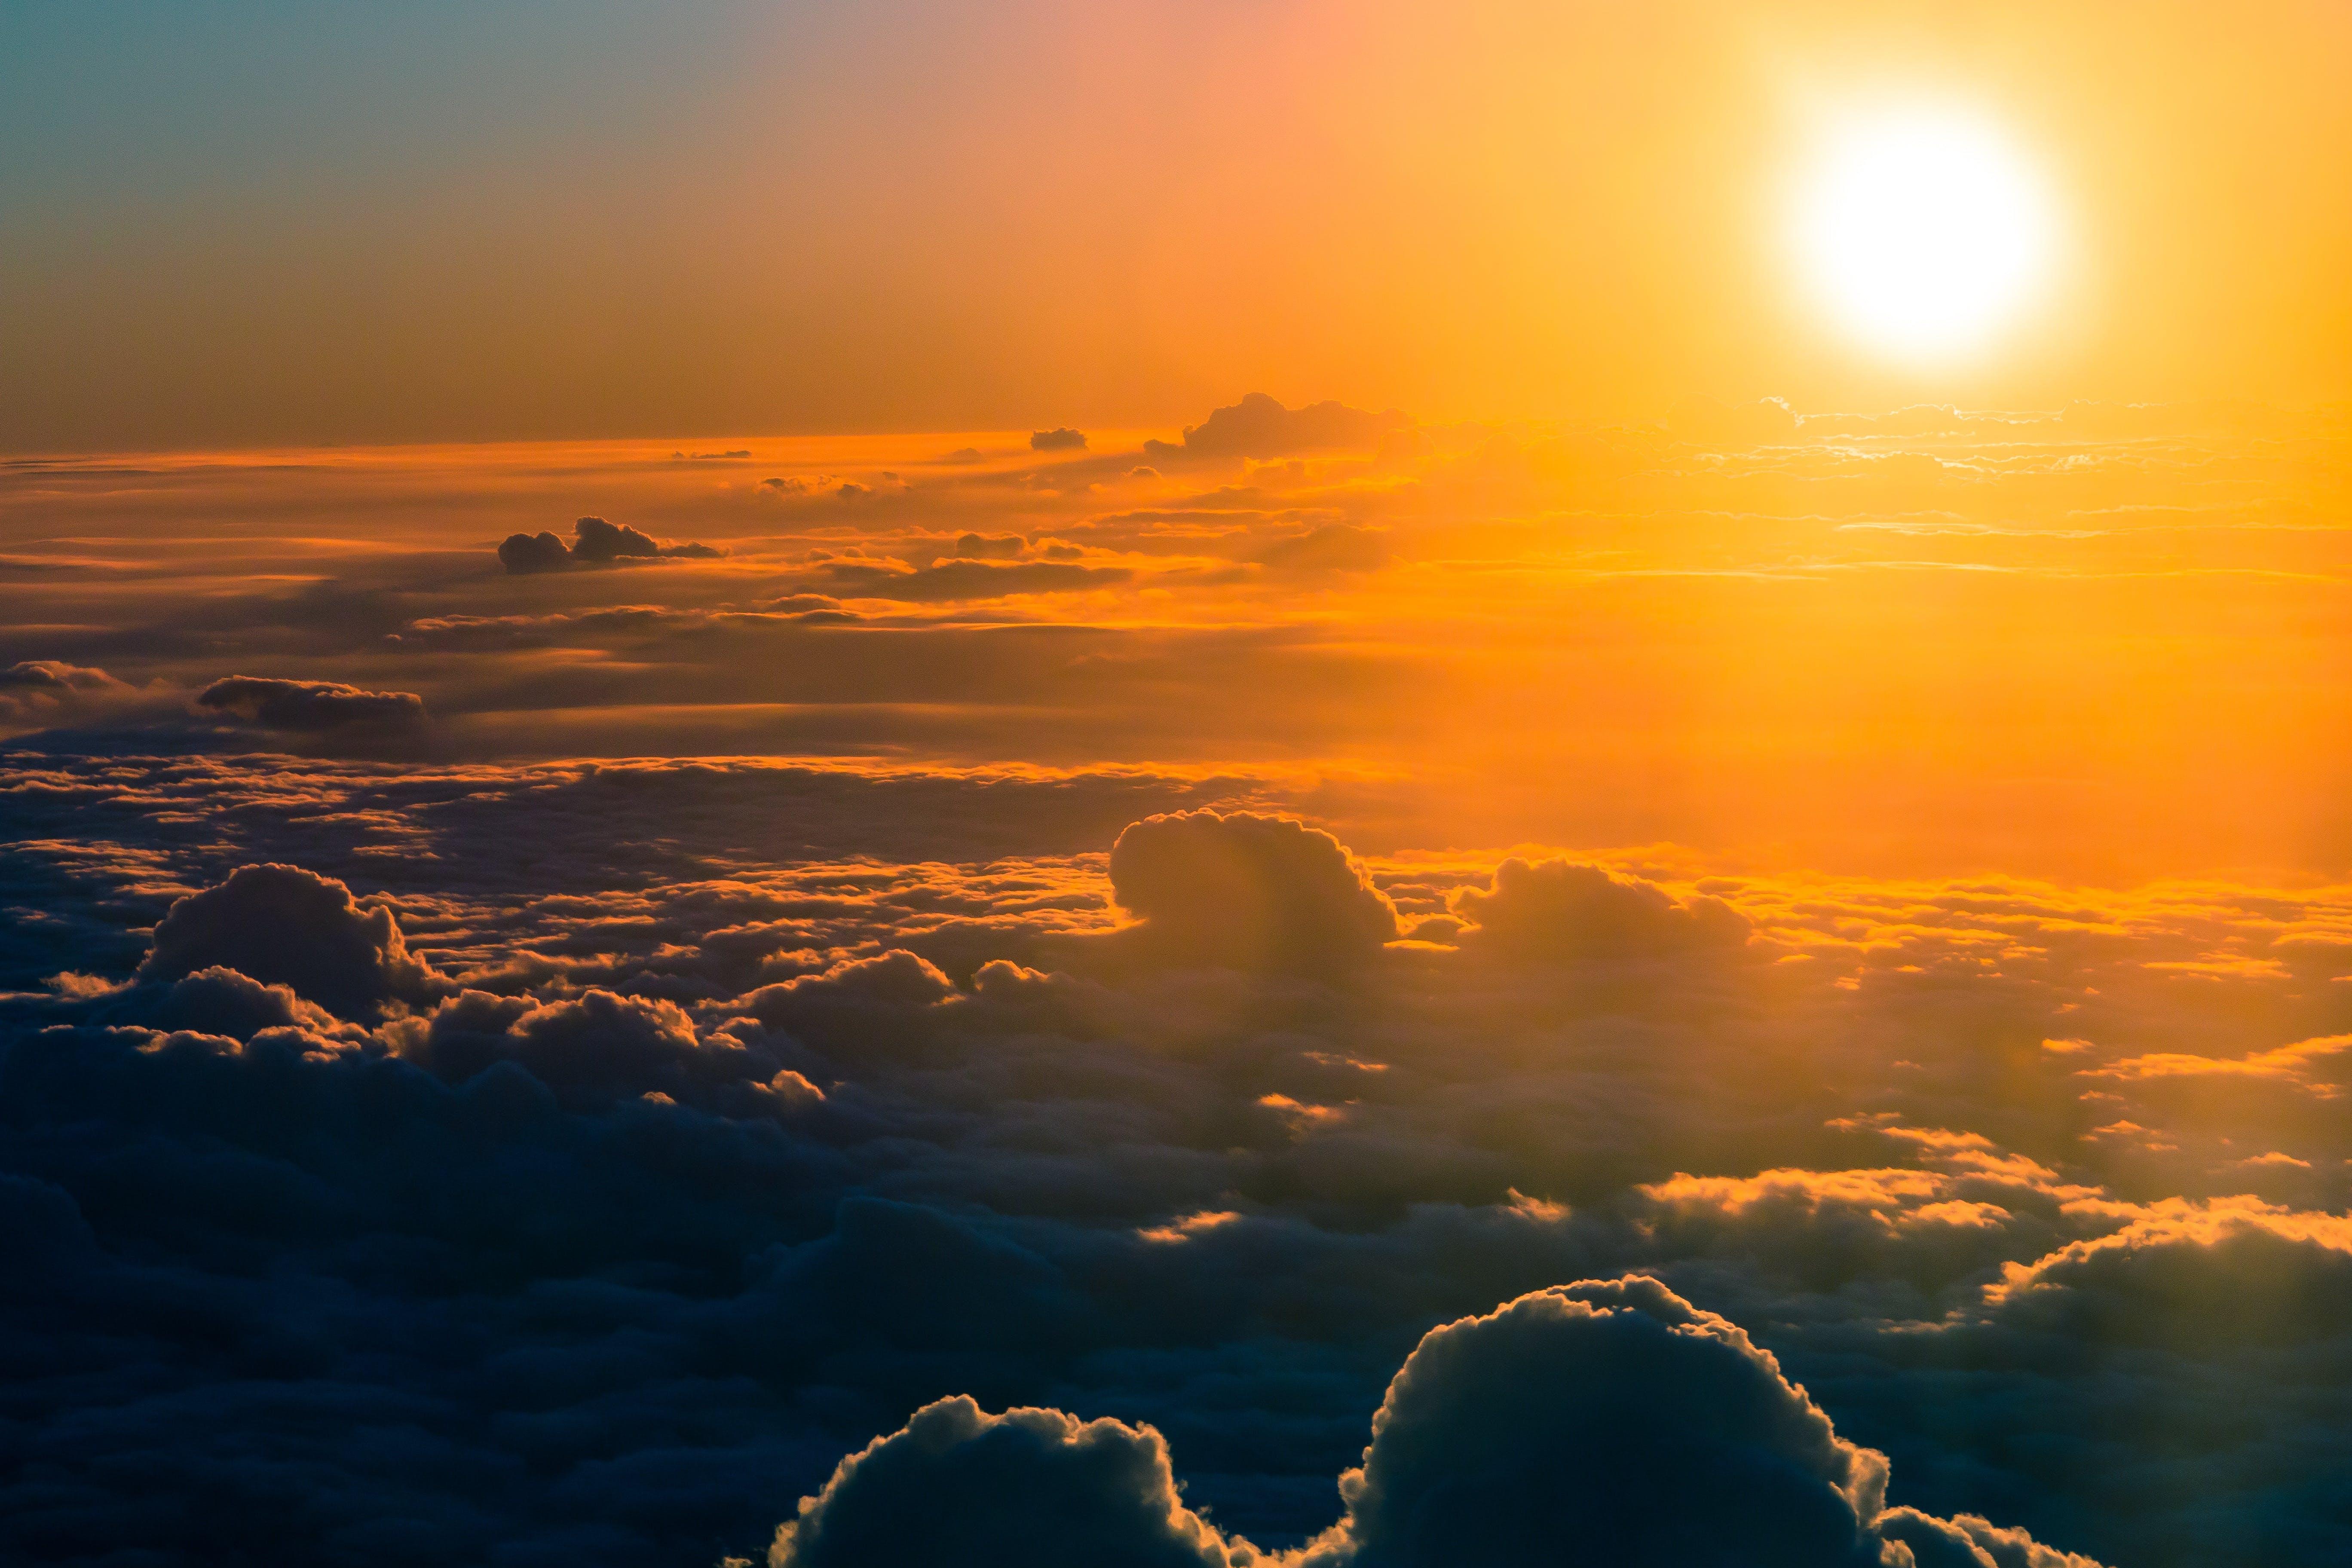 backlit, bright, clouds